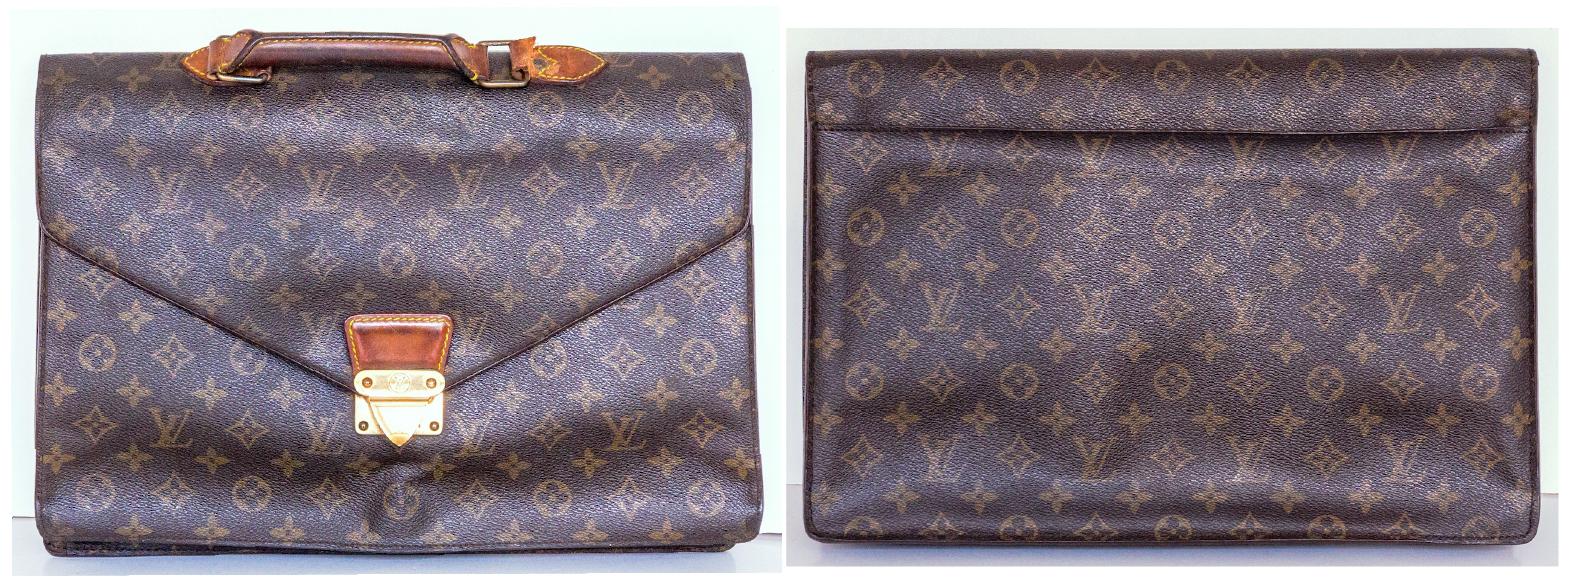 【LV皮包】 绝版Serviette Conseiller 公文包与 Palm Spring Mini 后背包